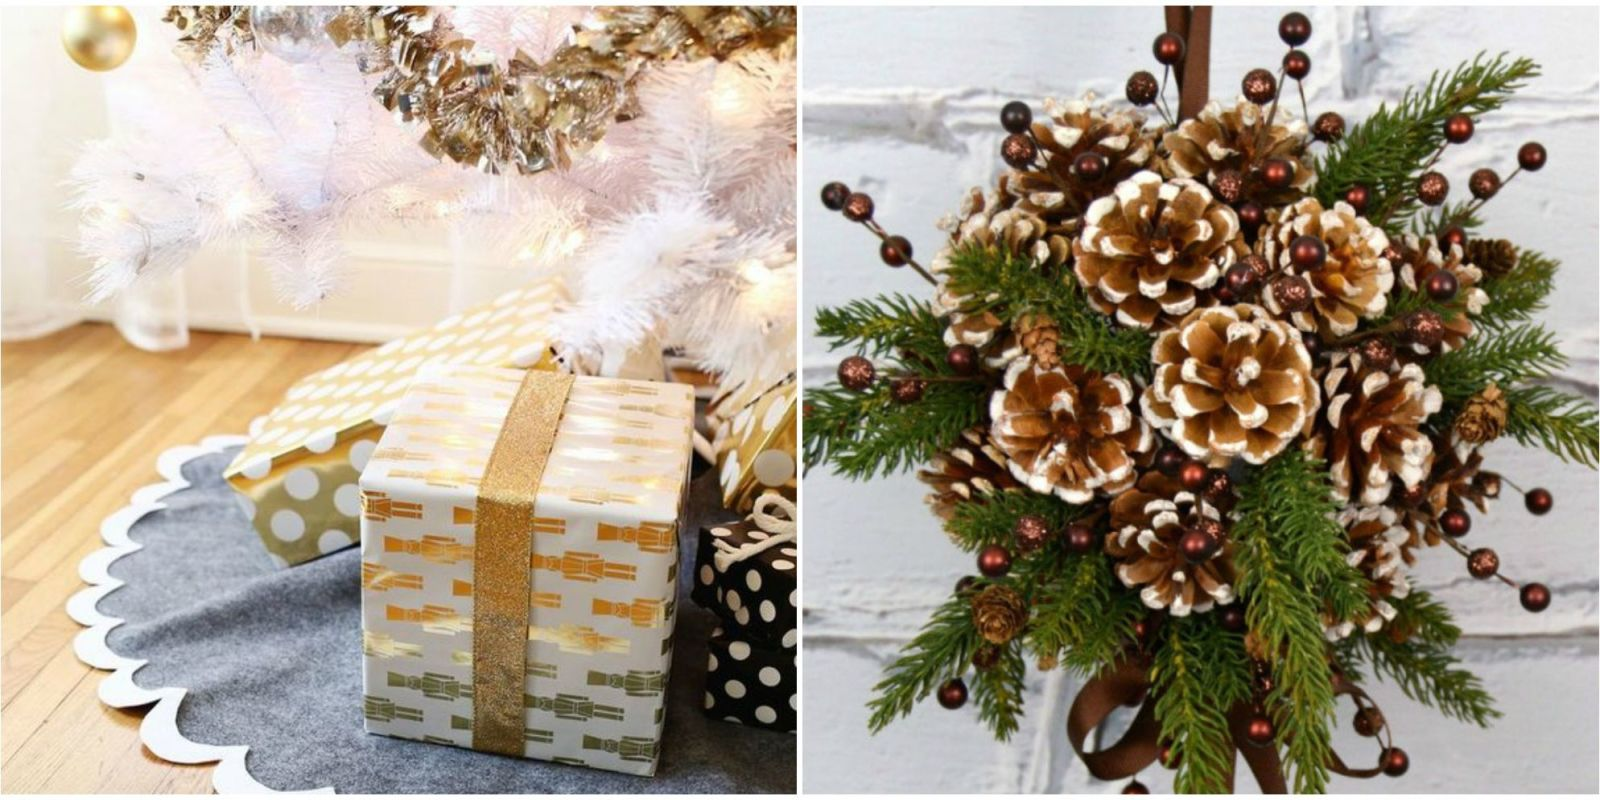 20 Easy DIY Christmas Decorations - Homemade Ideas for ...